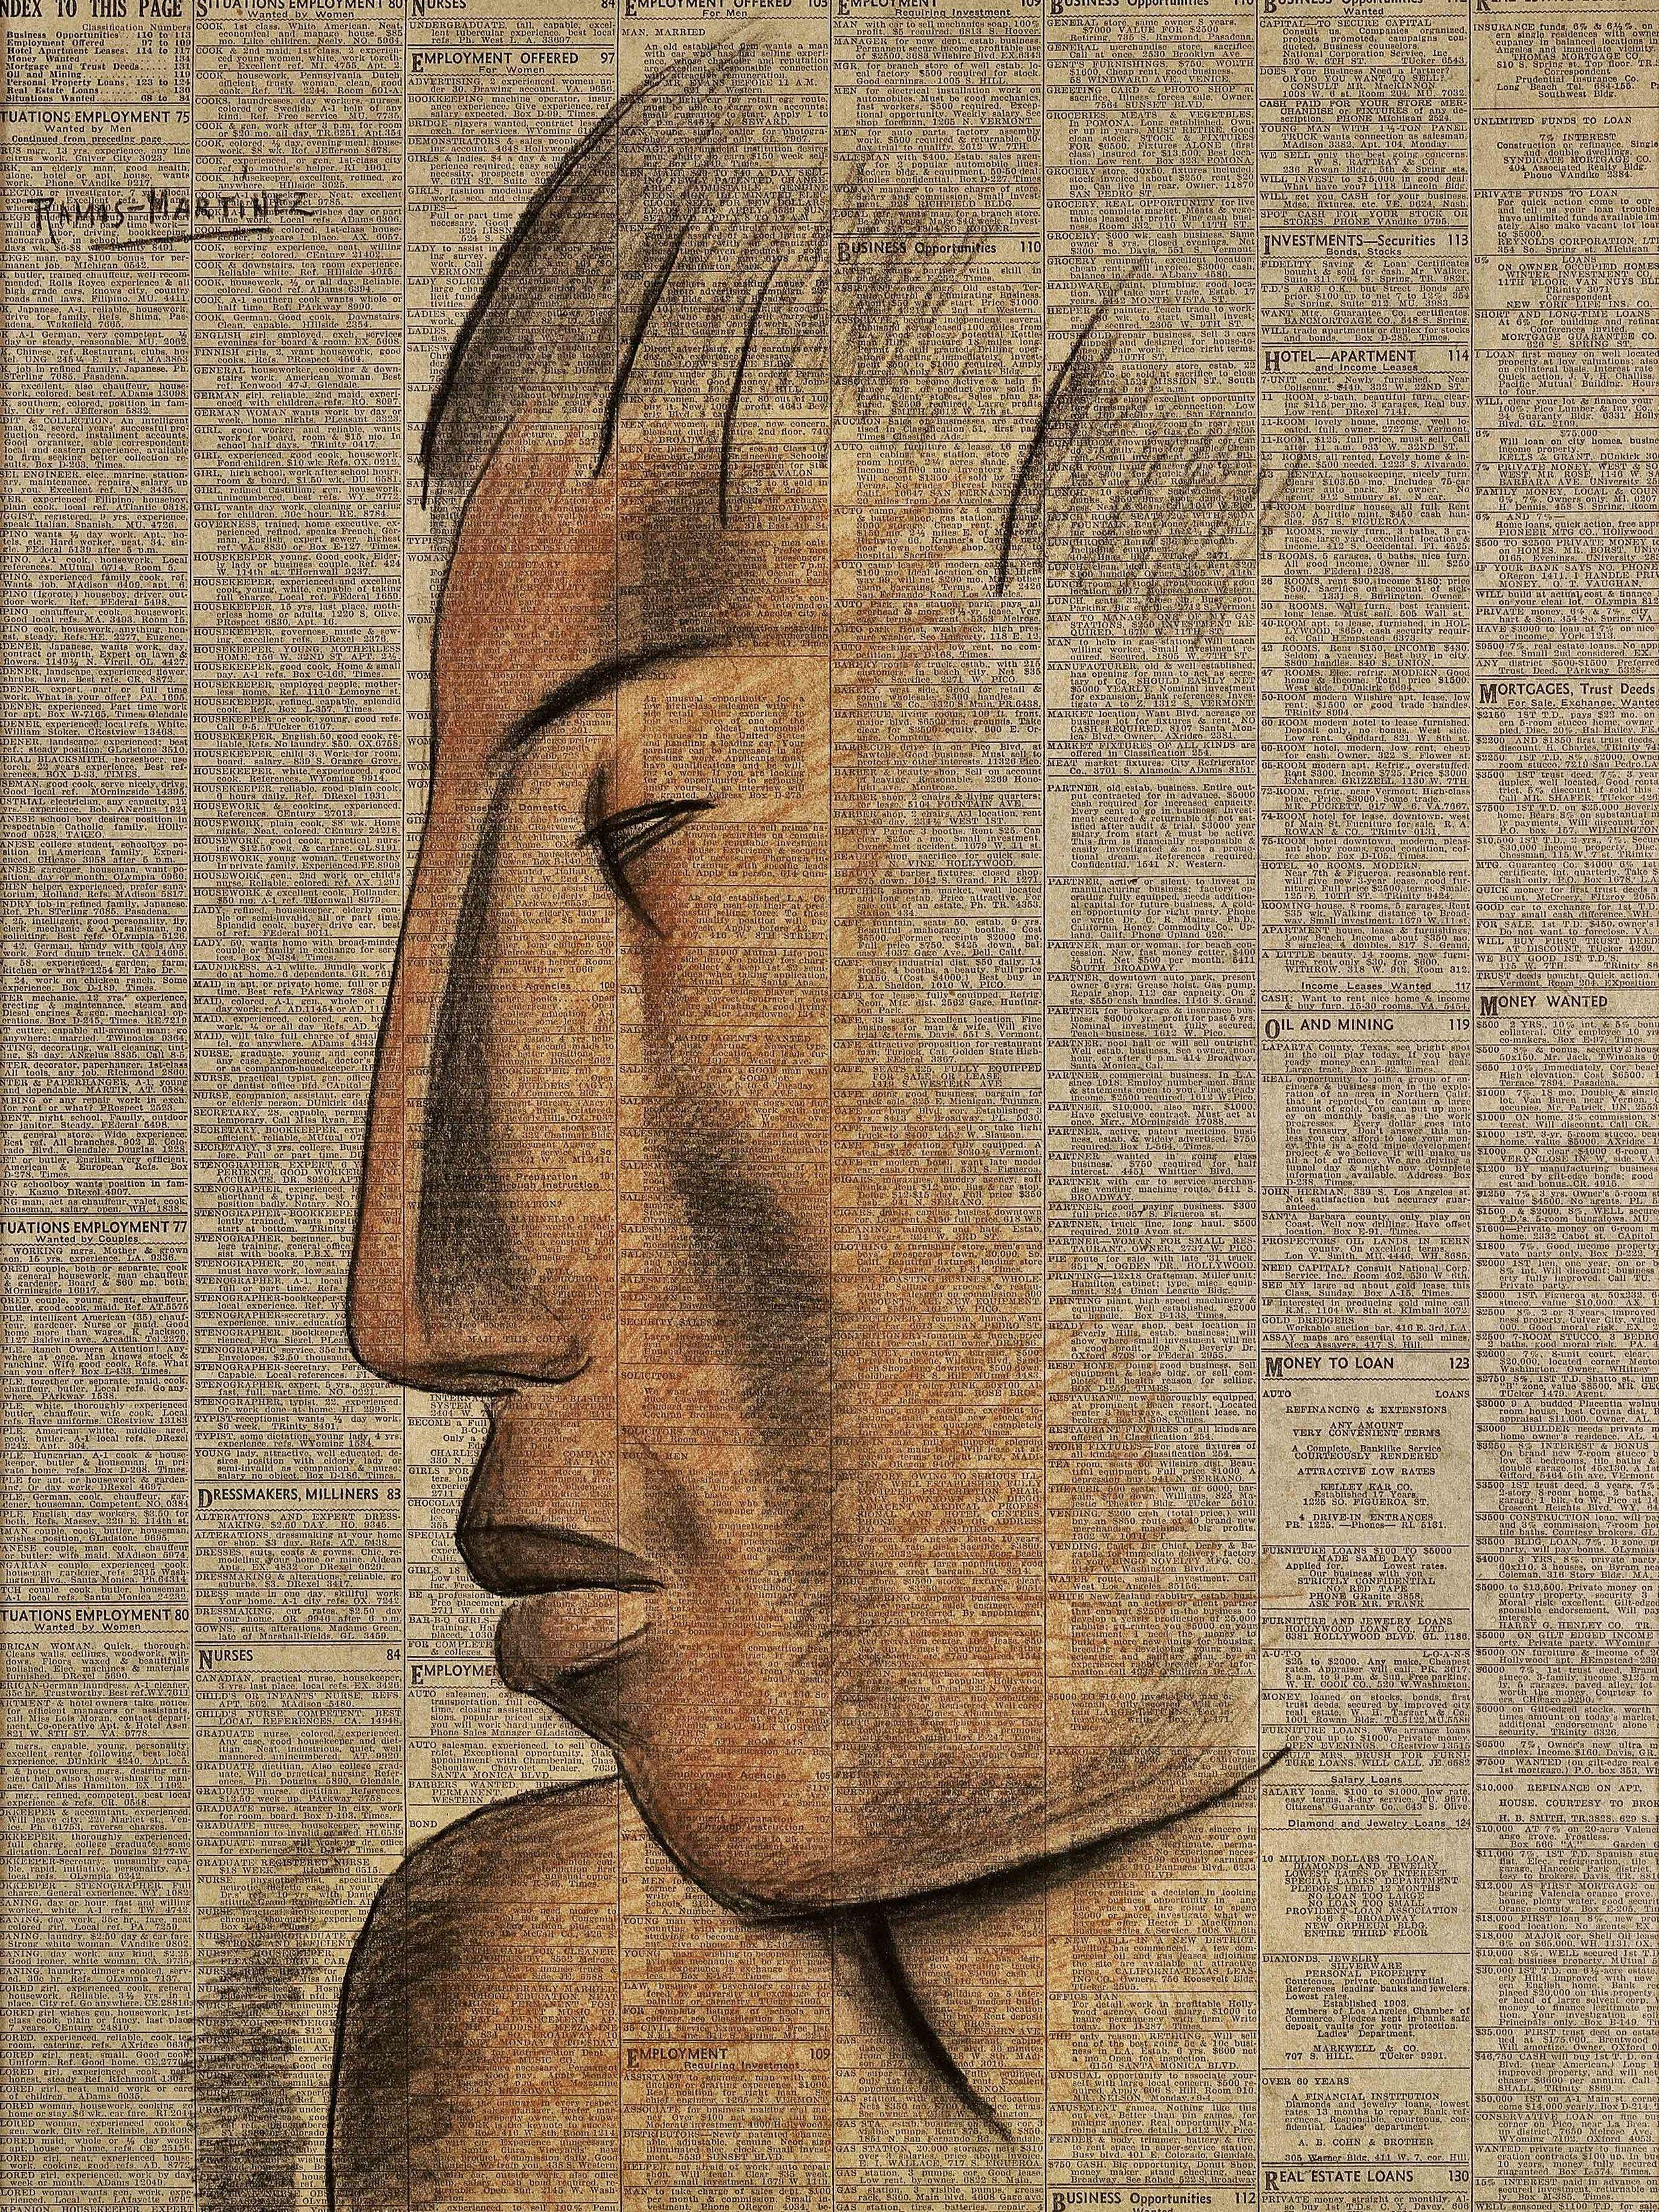 Perfil Azteca / Aztec Profile  1932 Conté crayon on newsprint / crayon Conté sobre papel periódico ( Los Angeles Times , May 16, 1932) 53 x 39.6 inches; 134.6 x 100.6 centímetros Private collection